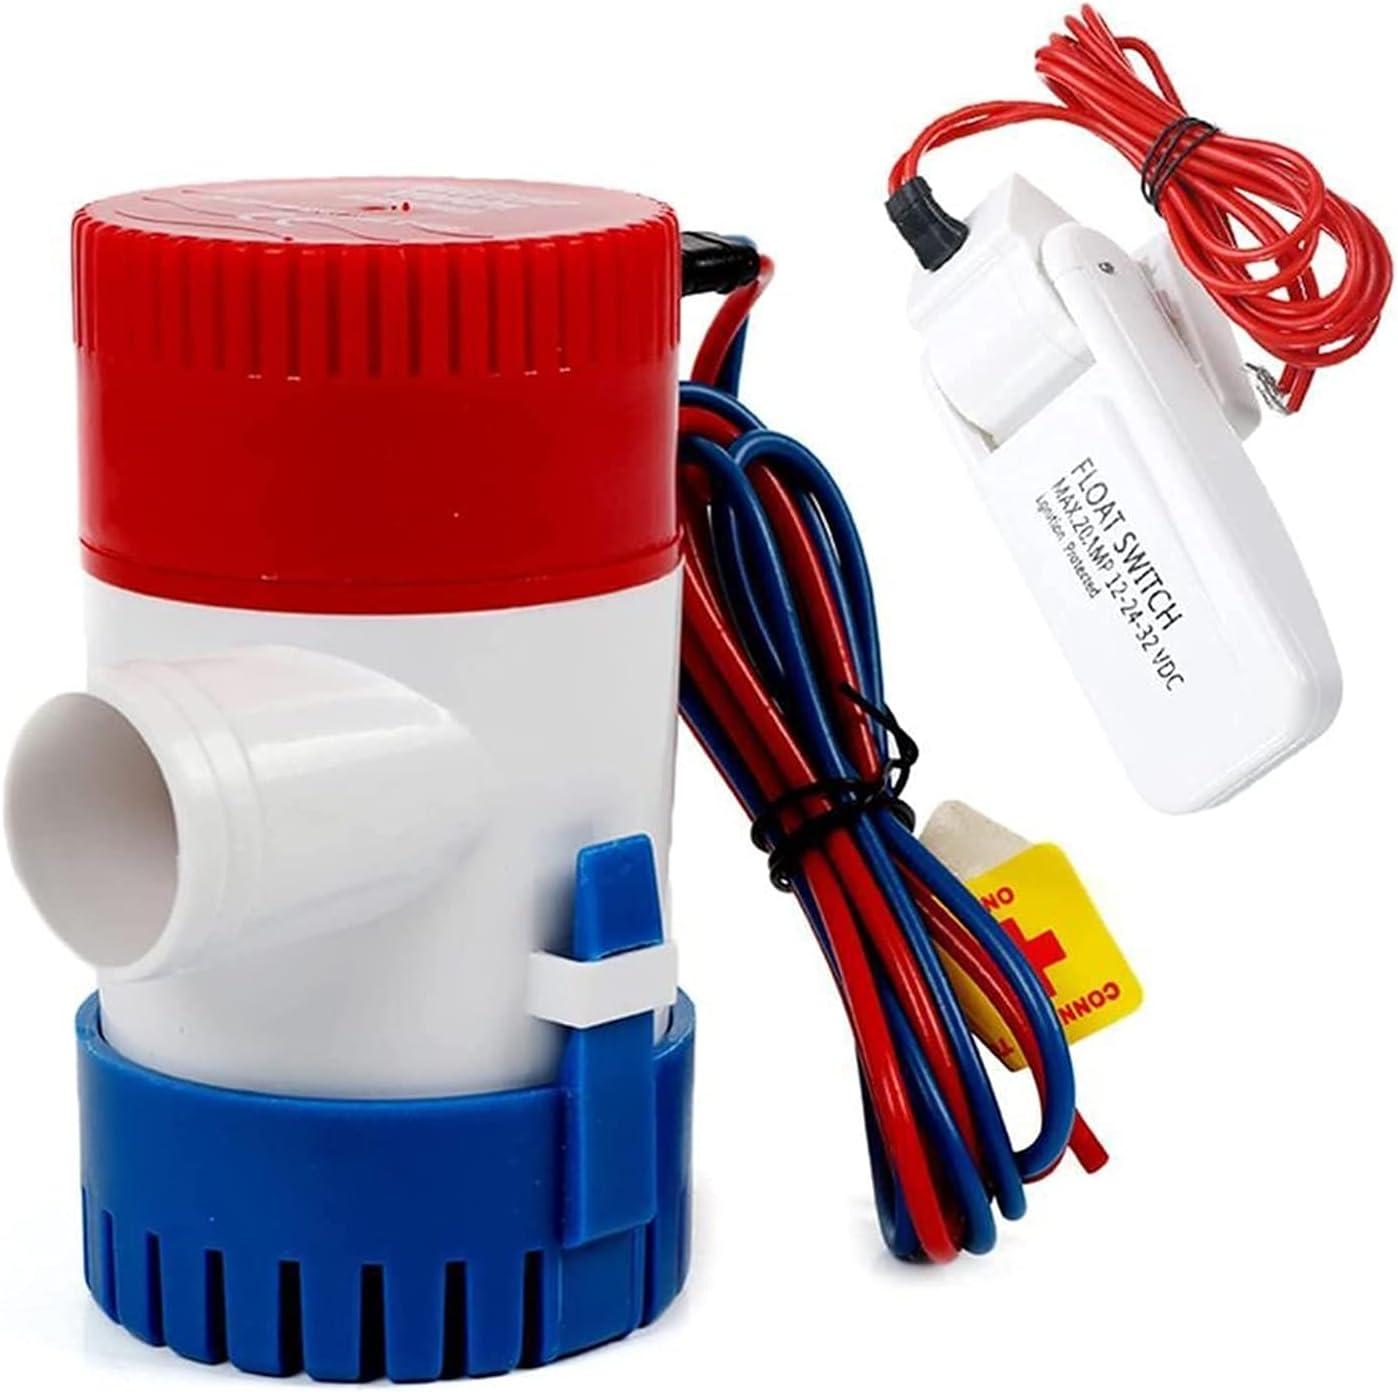 half Automatic Submersible Small Boat Dedication Bilge Electric 12V Pump 1100GPH